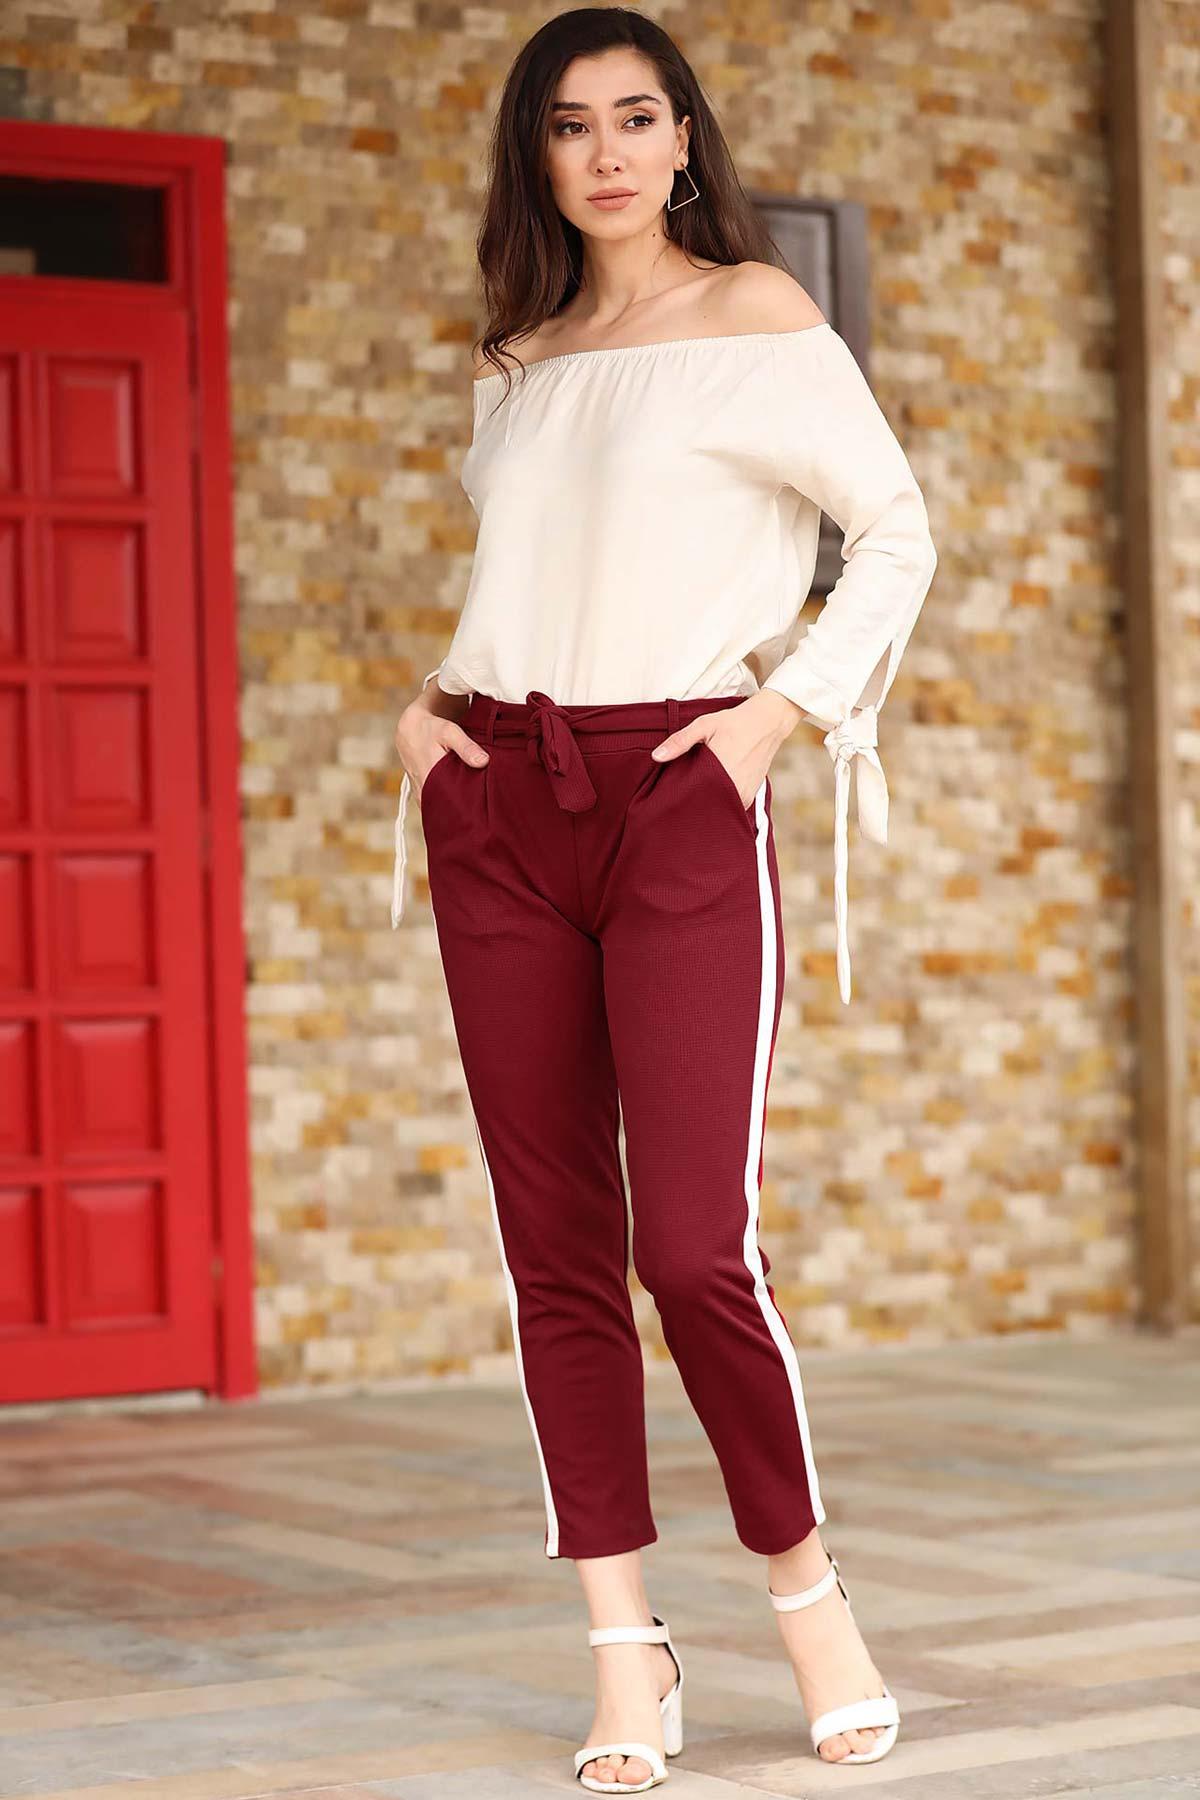 Women's Side Striped Claret Red Pants